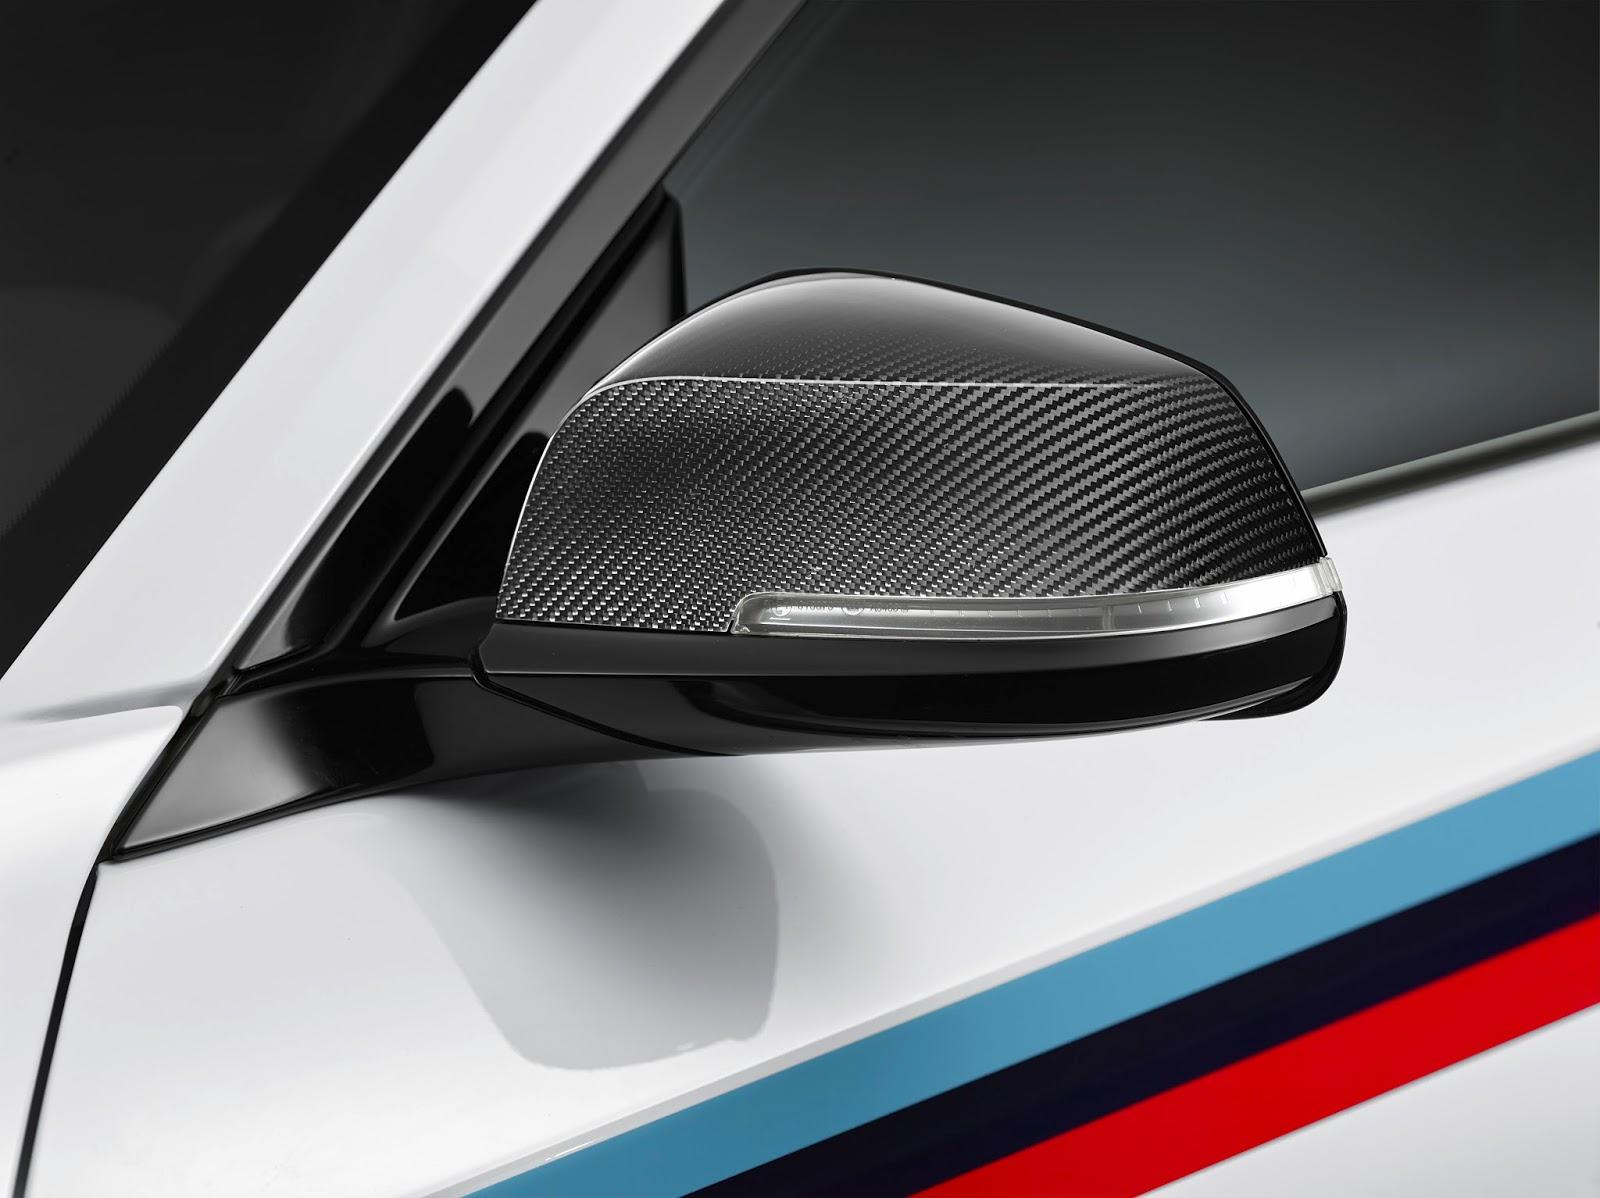 P90203613 highRes bmw m2 coup with bmw Νέα Αξεσουάρ M Performance για τη νέα BMW M2 Coupé. BMW, BMW M2, BMW M2 Coupé, Αξεσουάρ